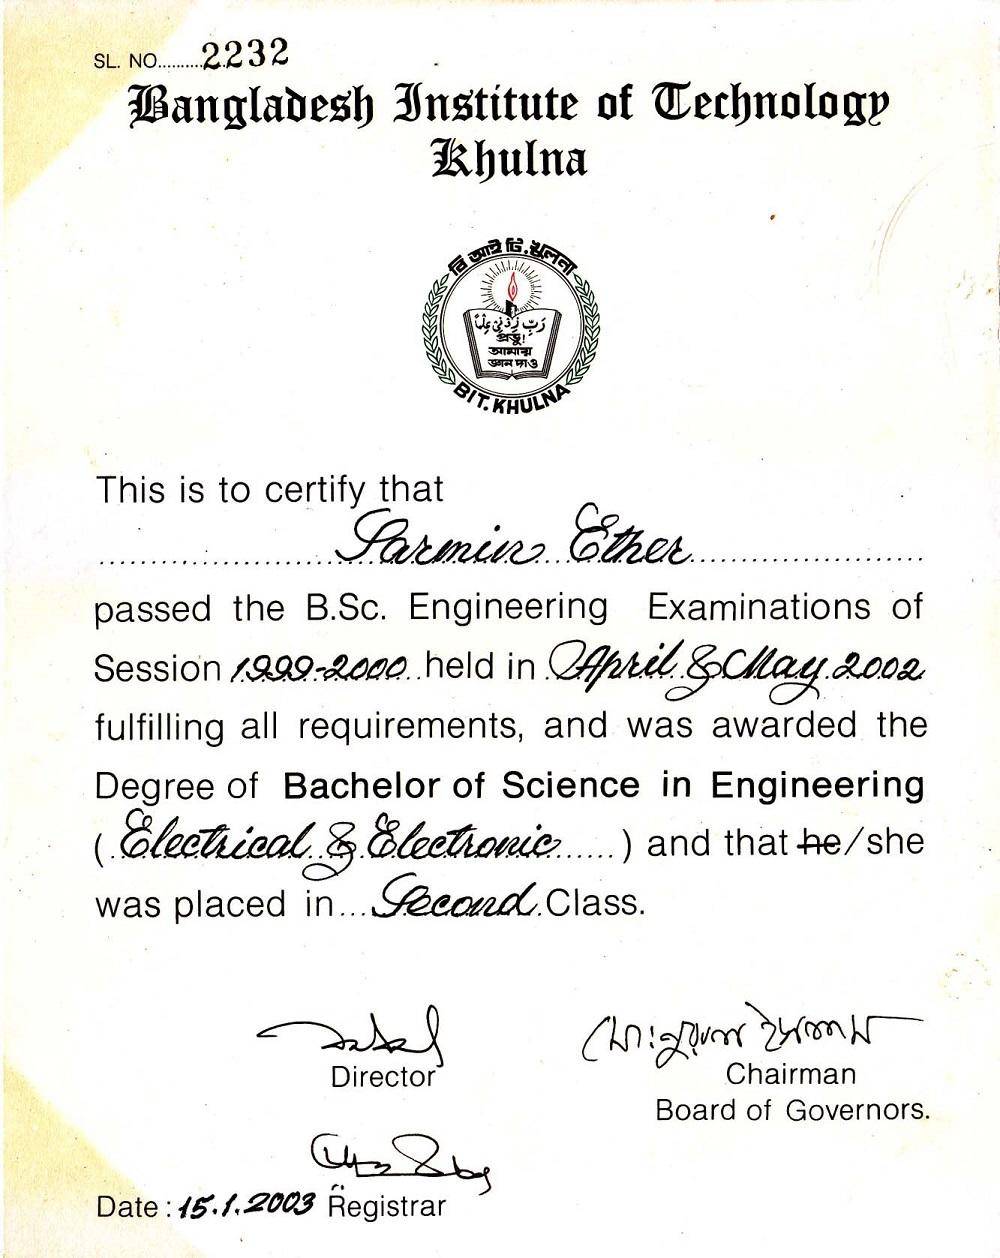 resume of engineer sarmin ether  curriculum vita of engineer sarmin ether